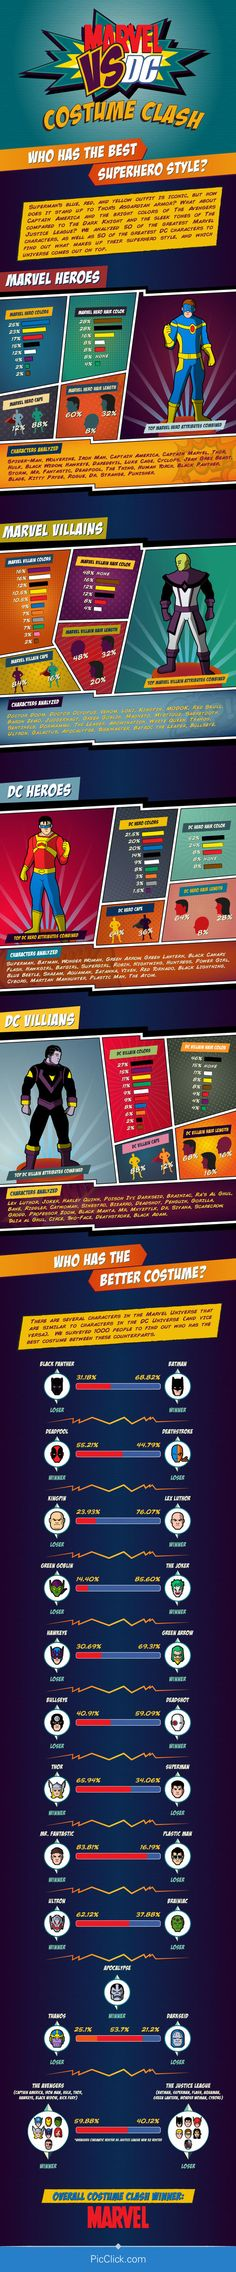 Marvel vs DC costume clash infographic